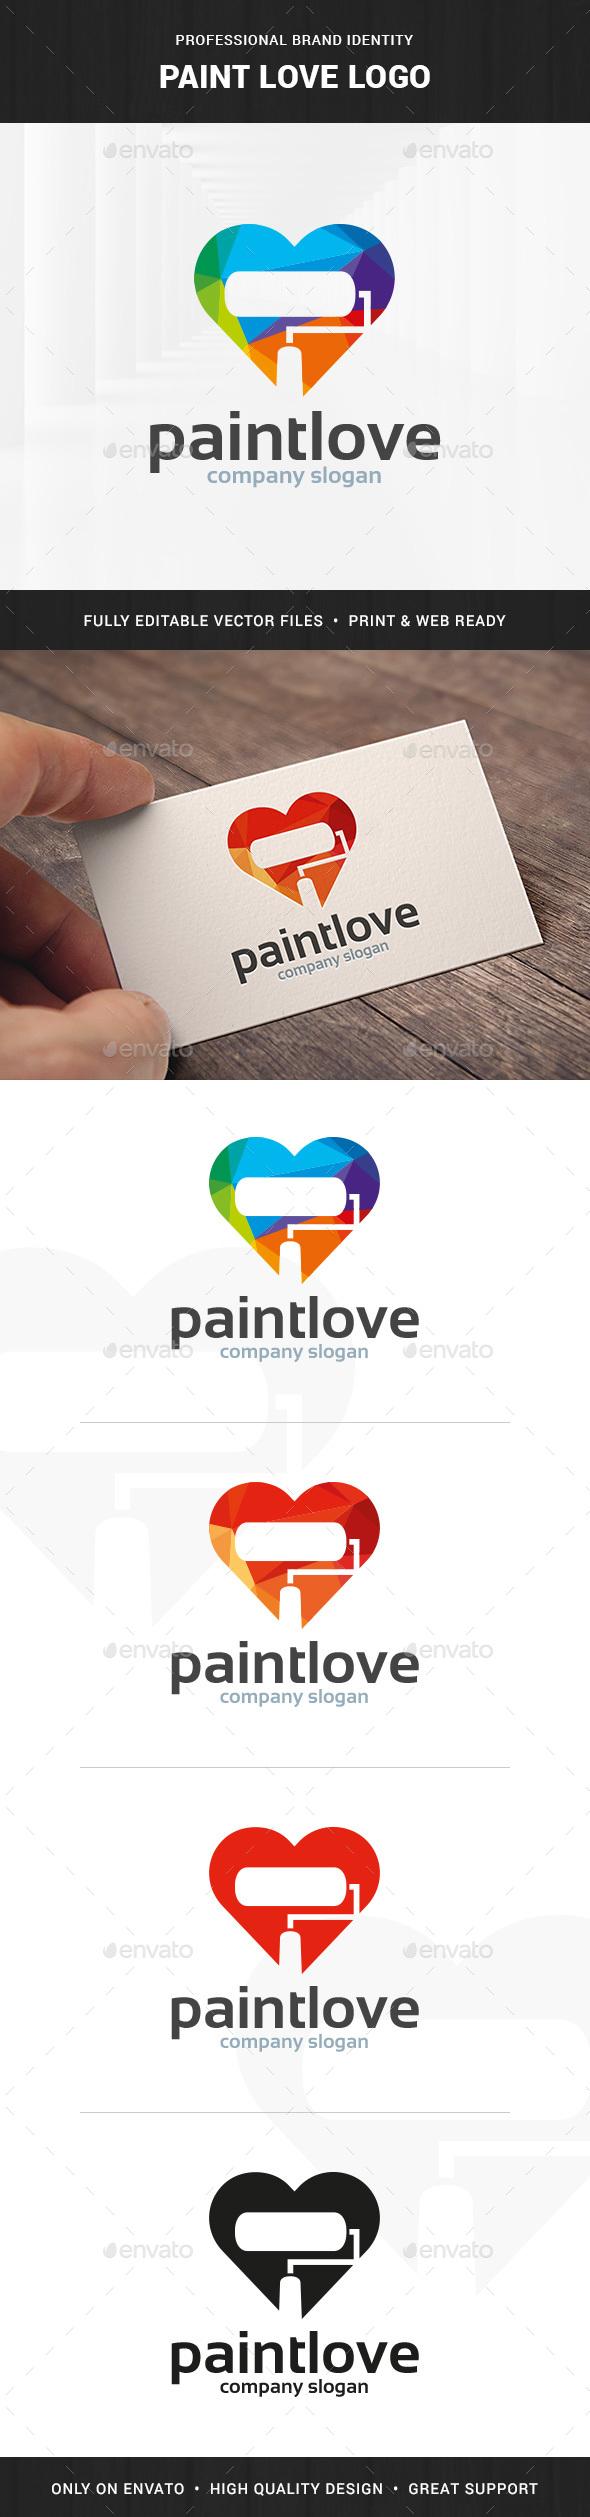 Paint Love Logo Template